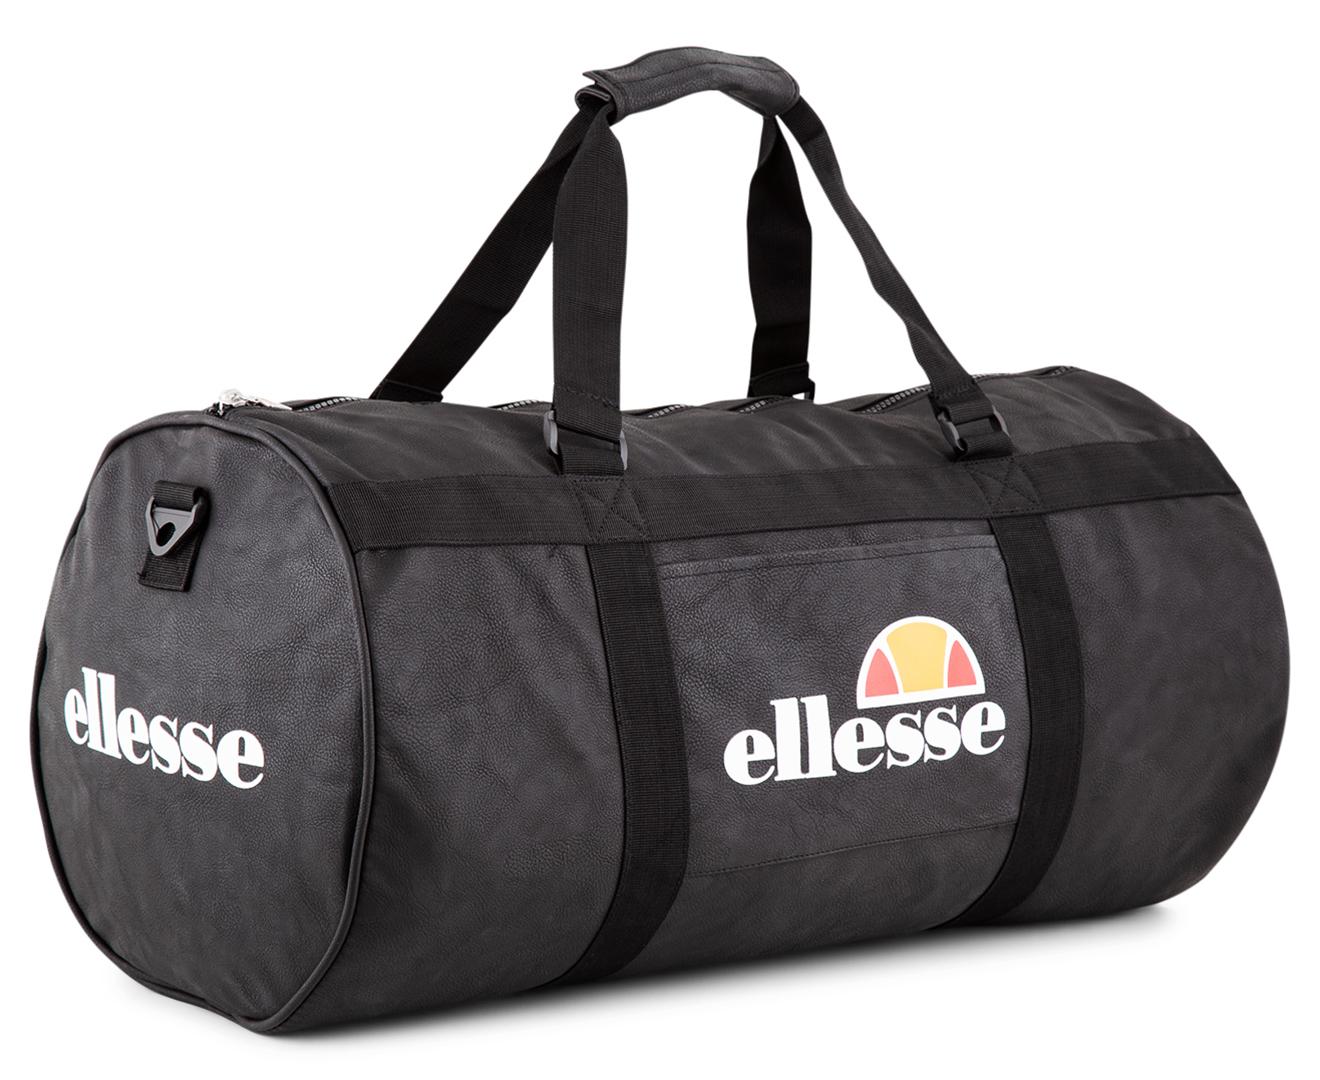 fcb773909ae3 Ellesse Velore Lux Duffle Bag - Black